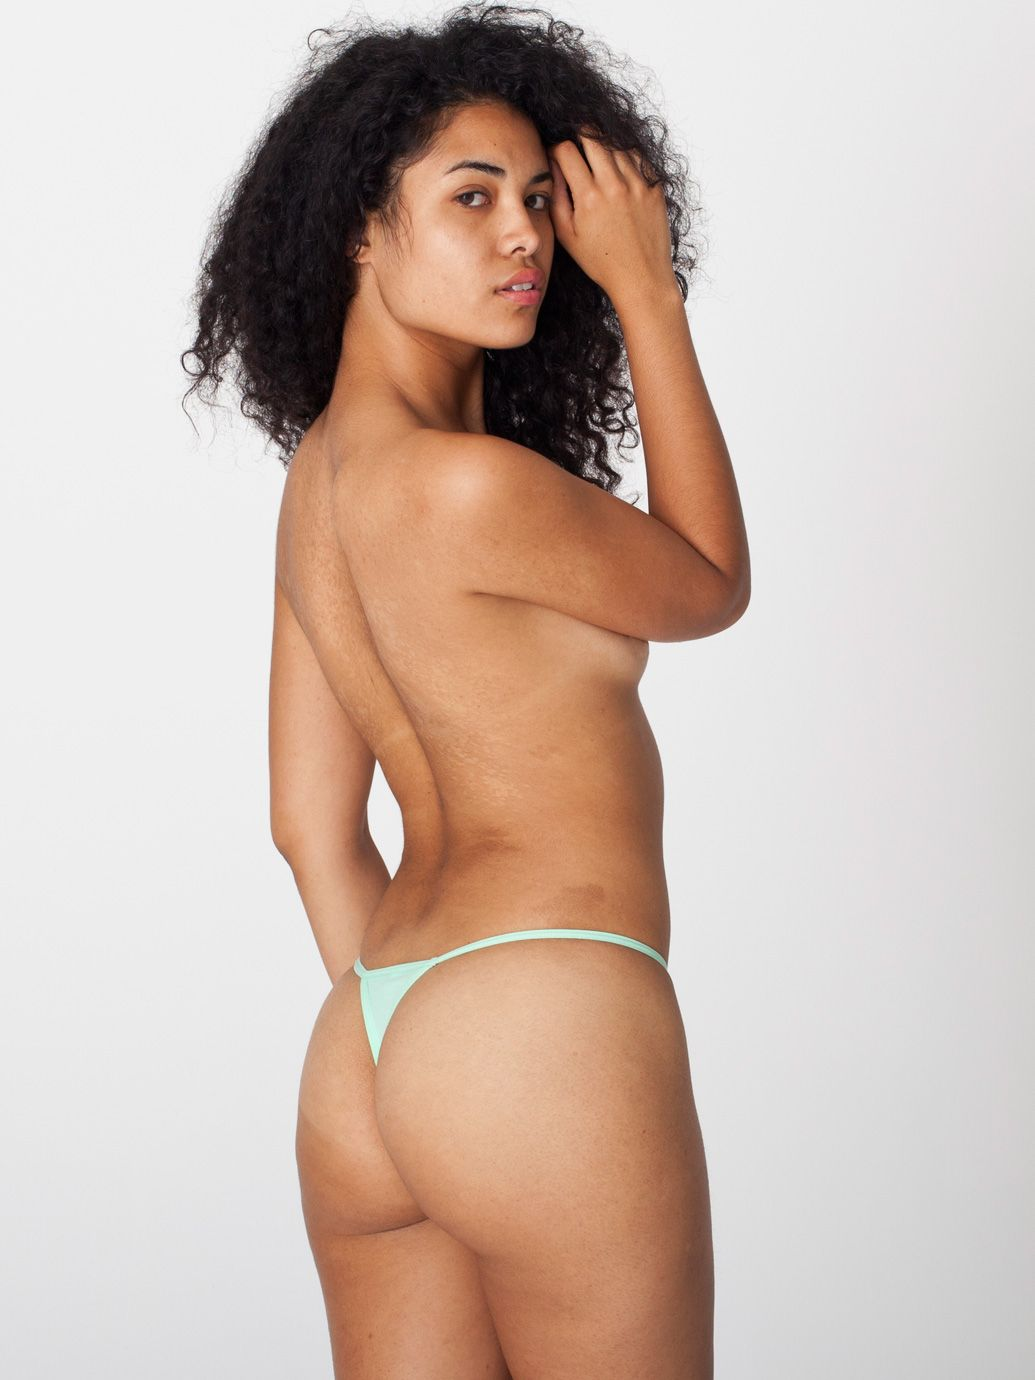 Nude masha model flats